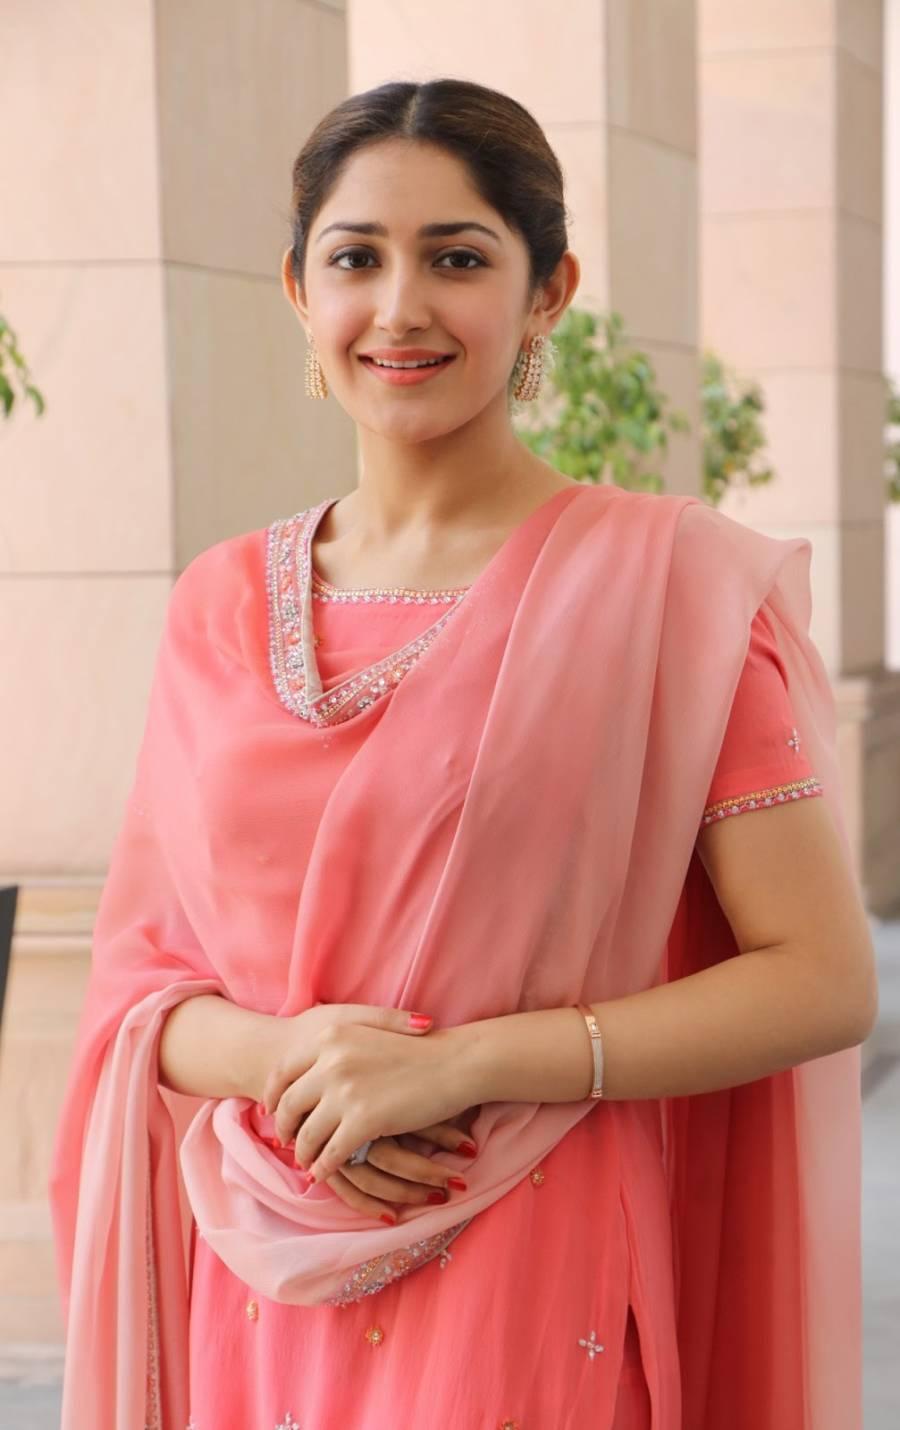 Indian Model Sayyeshaa Saigal Hot In Pinks Punjabi Dress